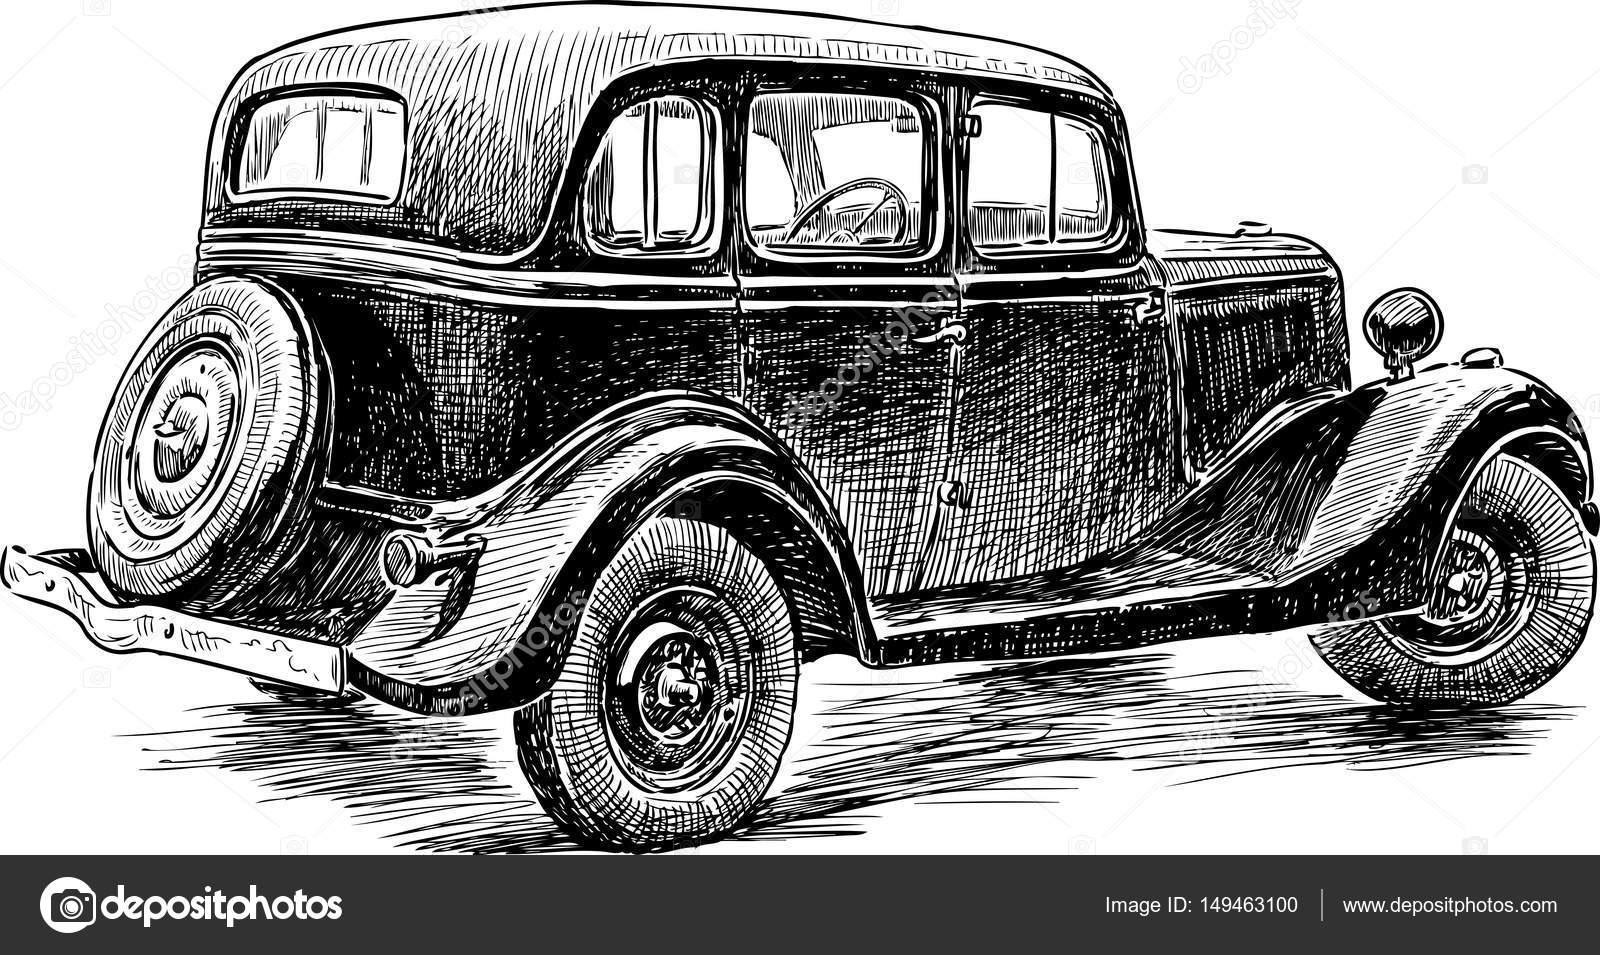 Skizze eines Retro-Autos — Stockvektor © alekseimakarov #149463100